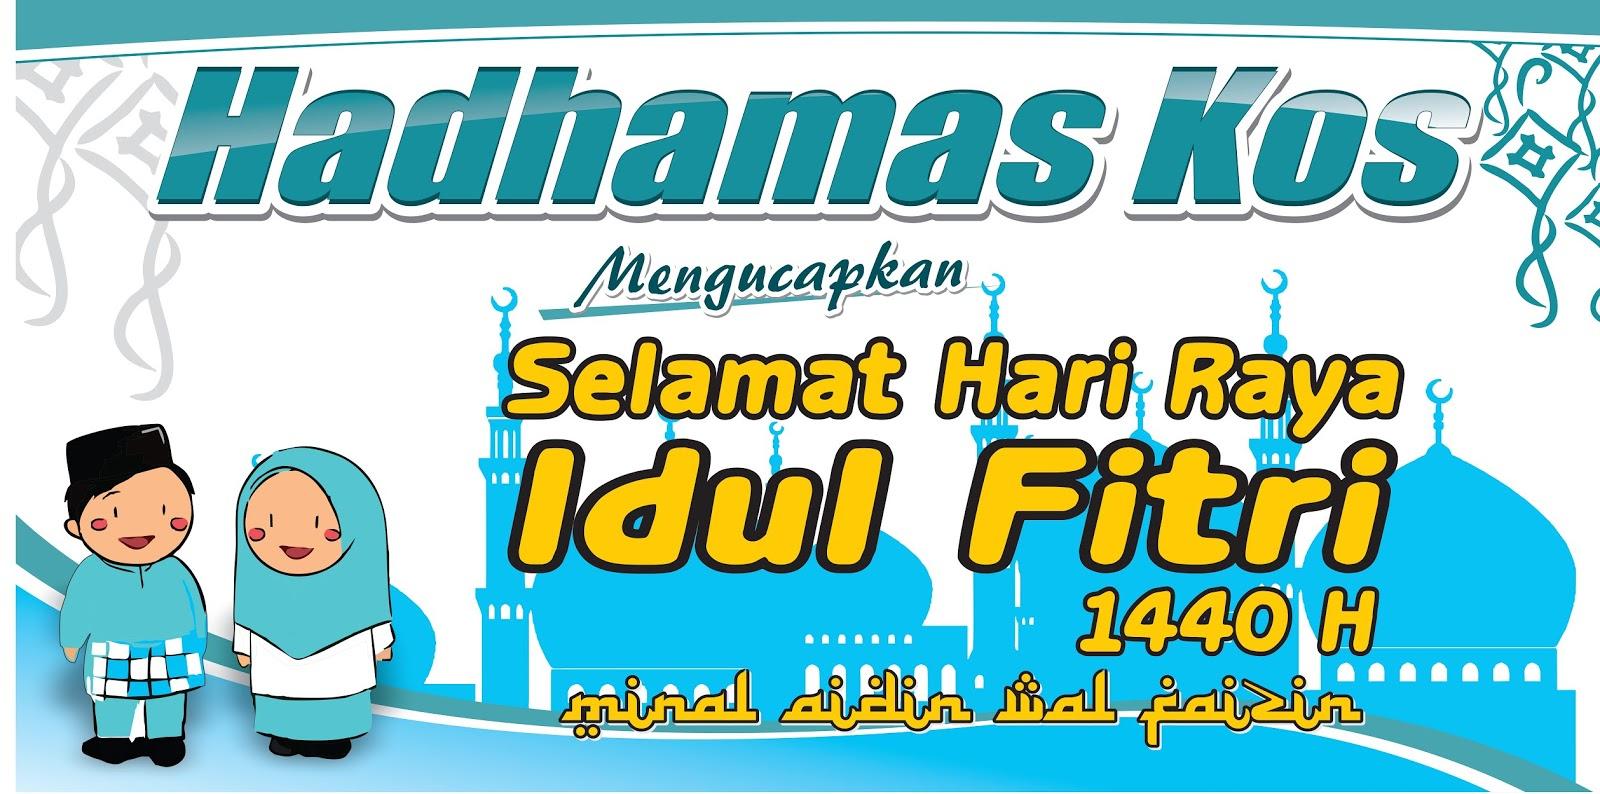 Spanduk Banner Selamat Hari Raya Idul Fitri